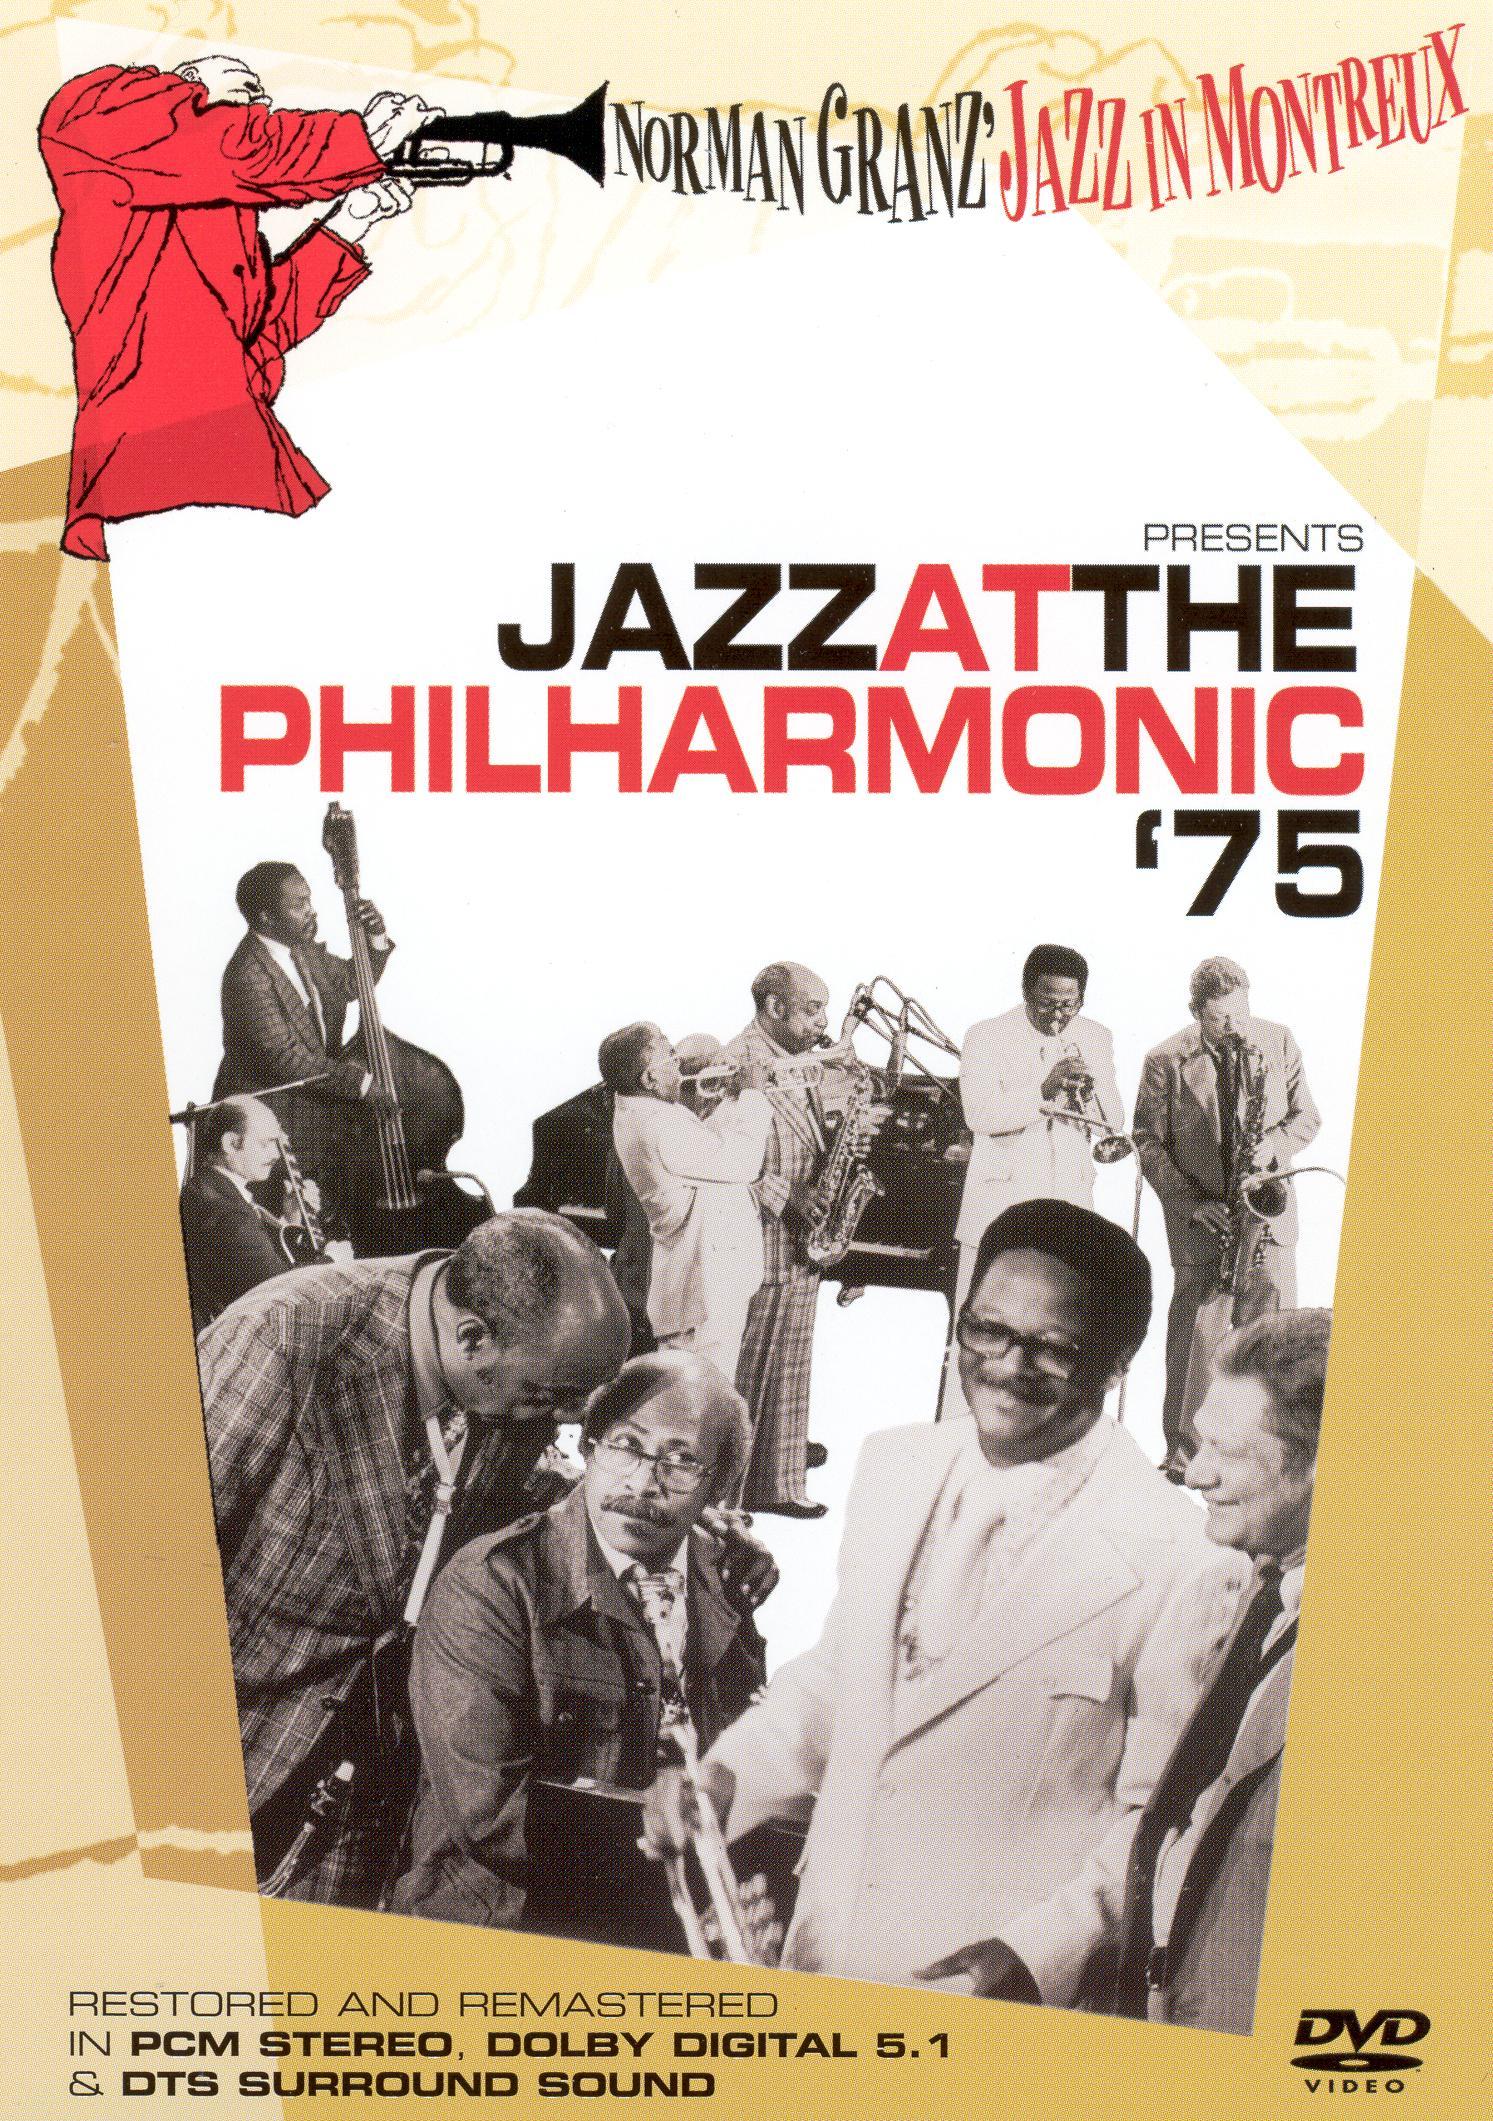 Jazz at the Philharmonic '75